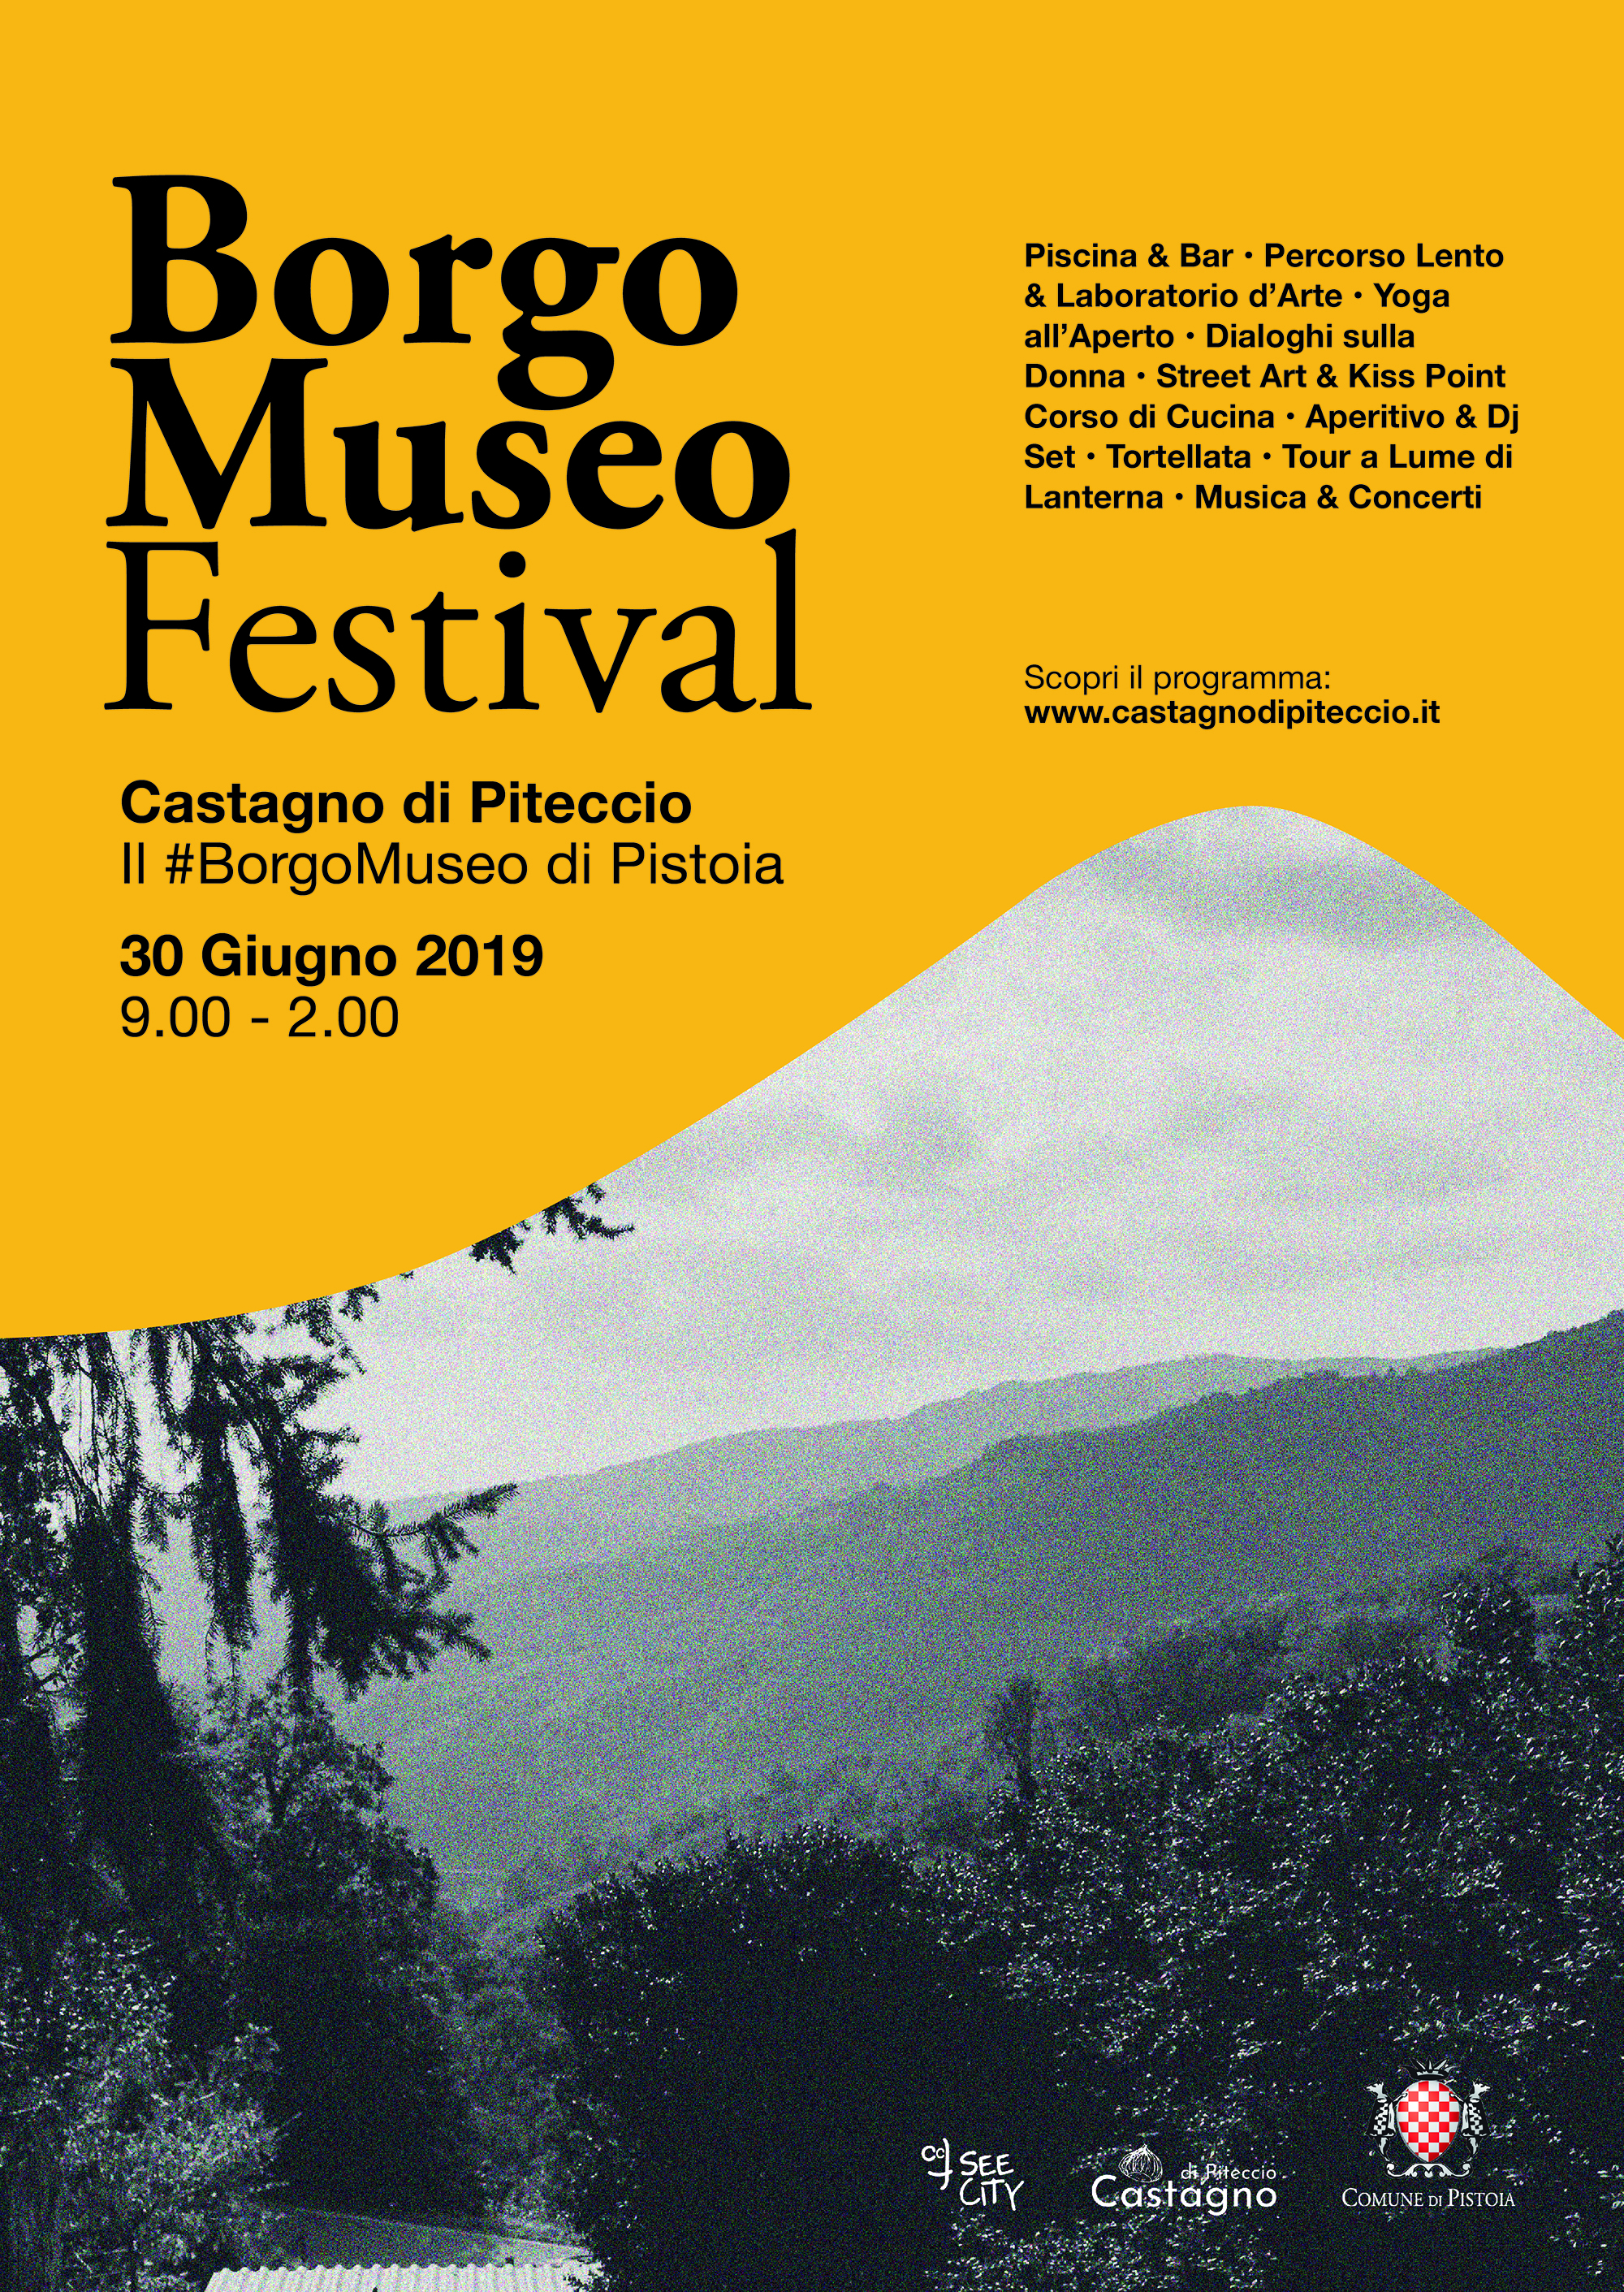 BORGO MUSEO FESTIVAL 2019 LOCANDINA web.jpg